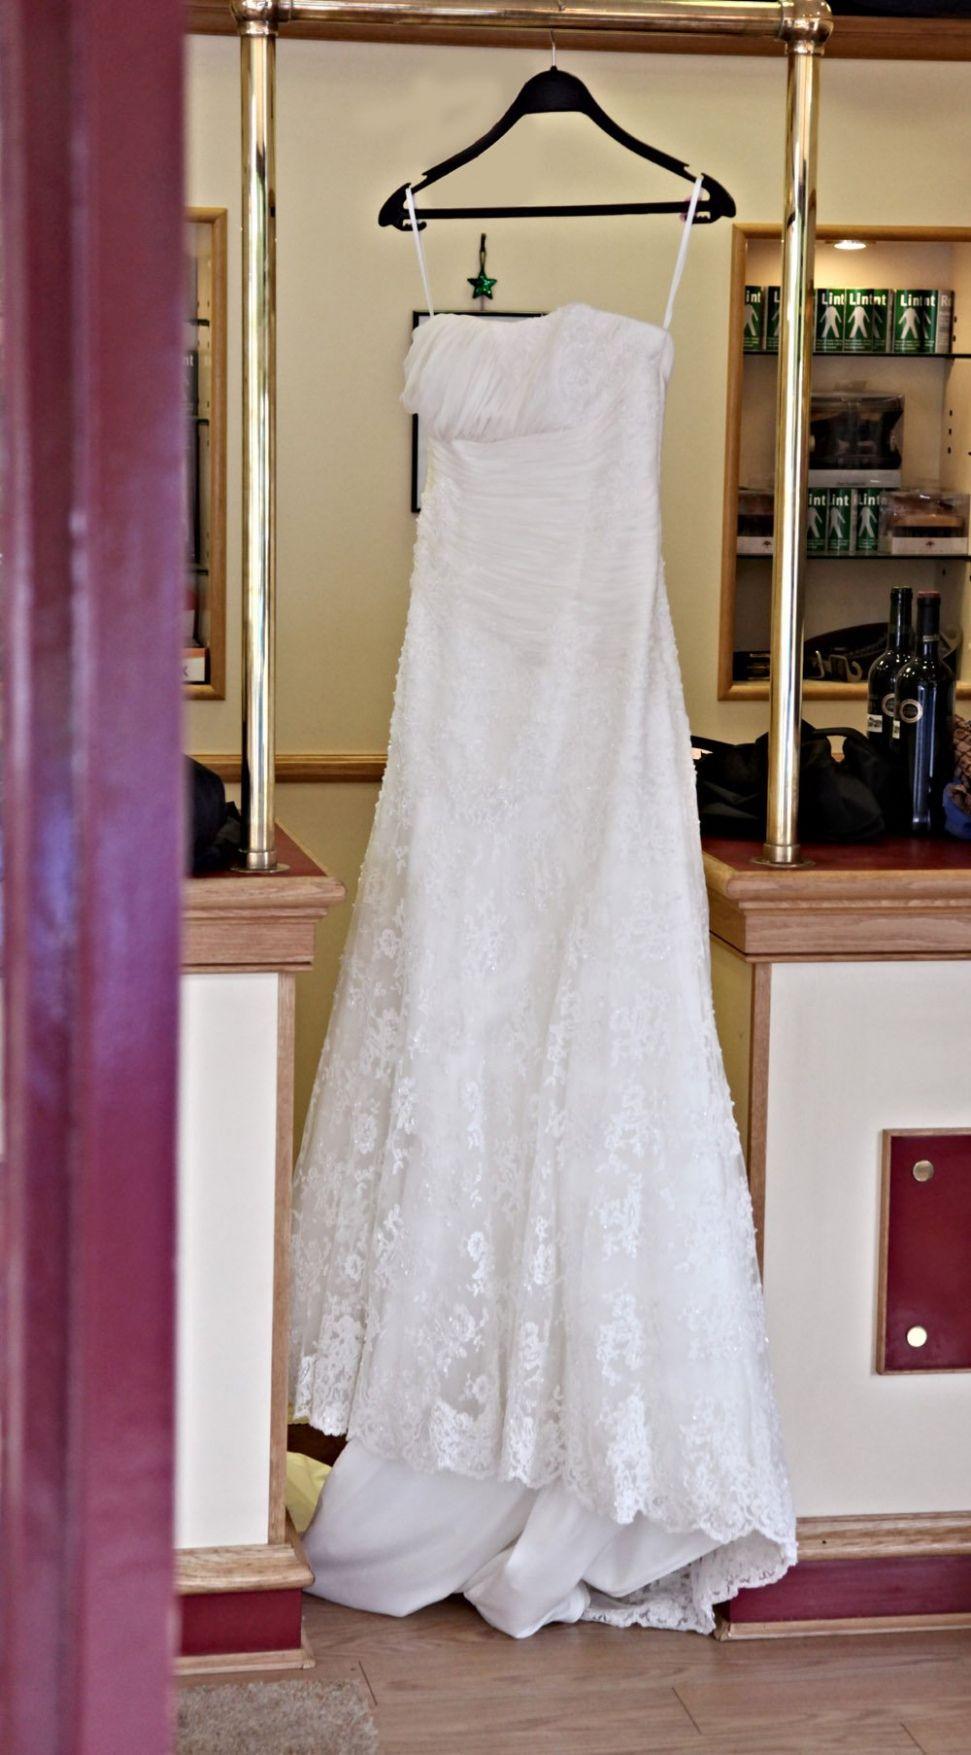 Country dresses for weddings   Wedding Dress Cleaning Kent  Country Dresses for Weddings Check